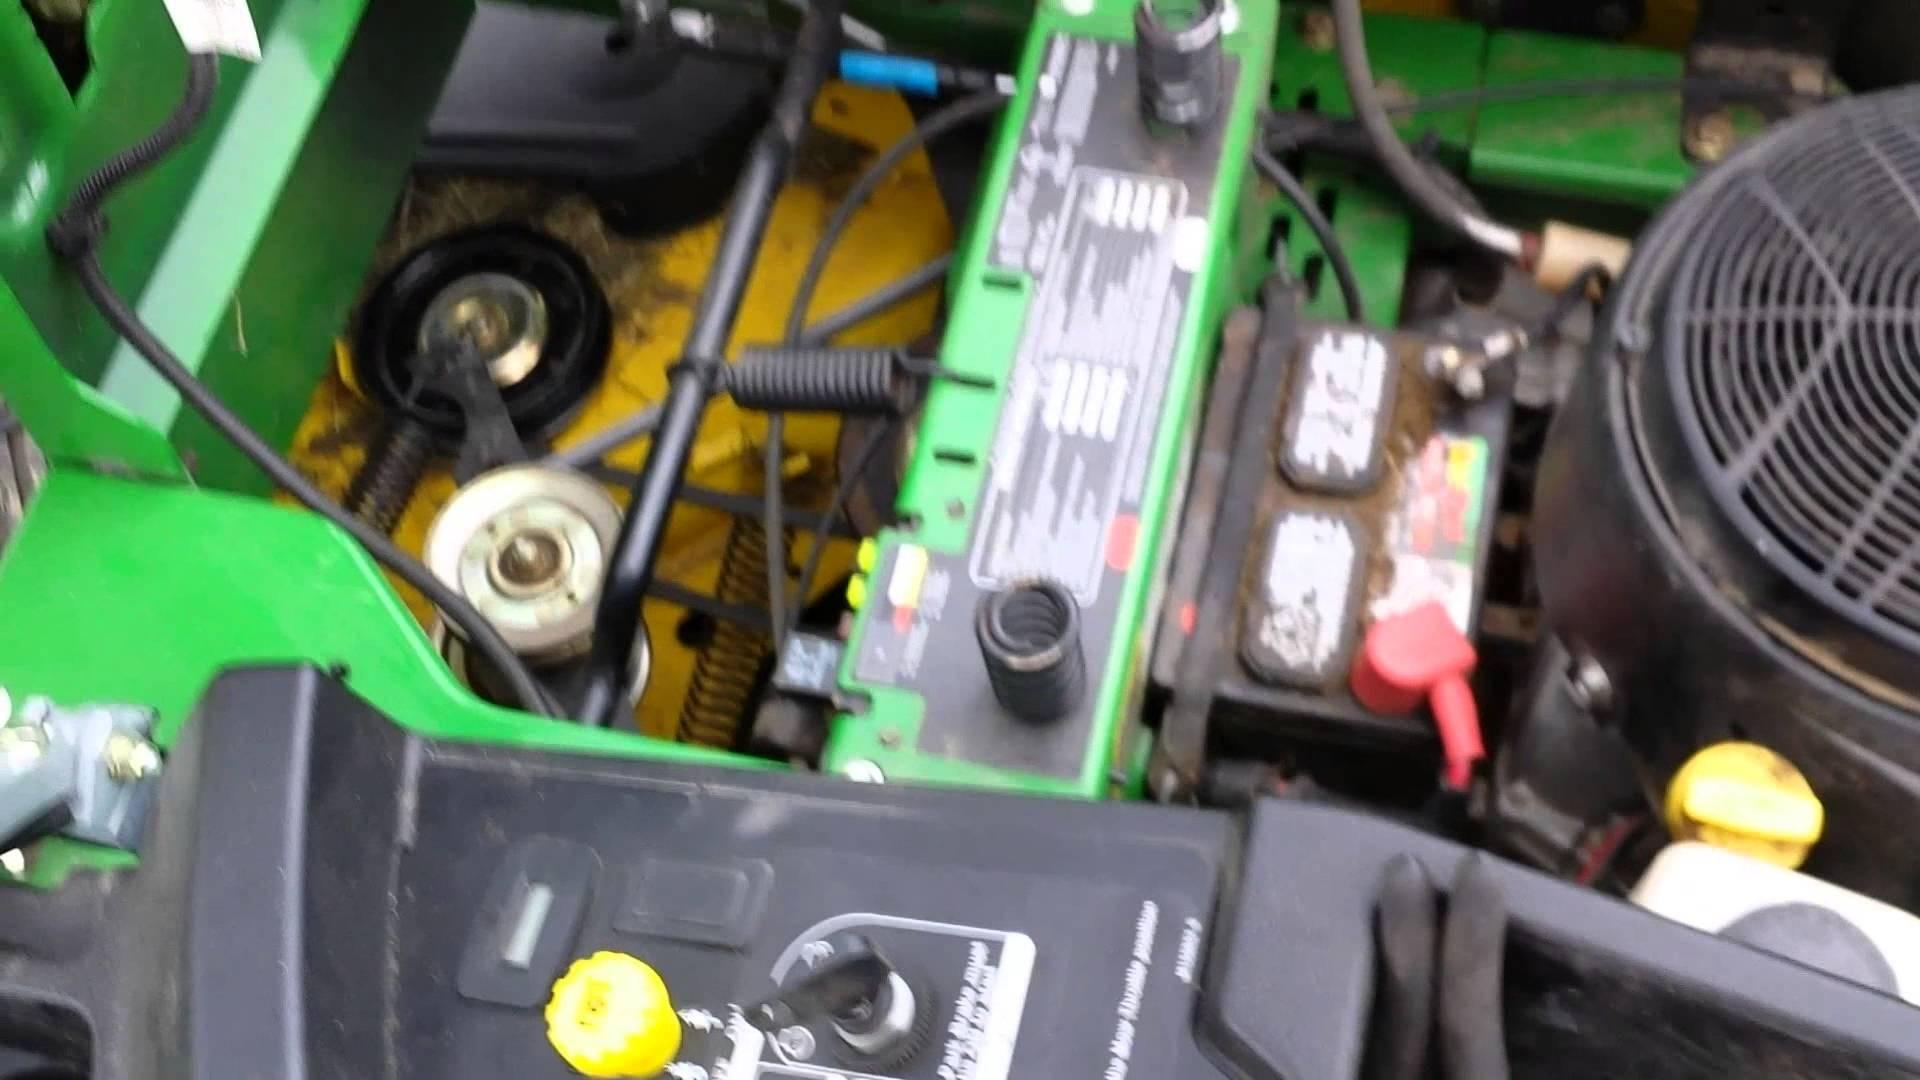 hight resolution of john deere z225 engine parts diagram john deere z425 won t start of john deere z225 john deere z225 engine parts diagram john deere 1070 wiring schematic